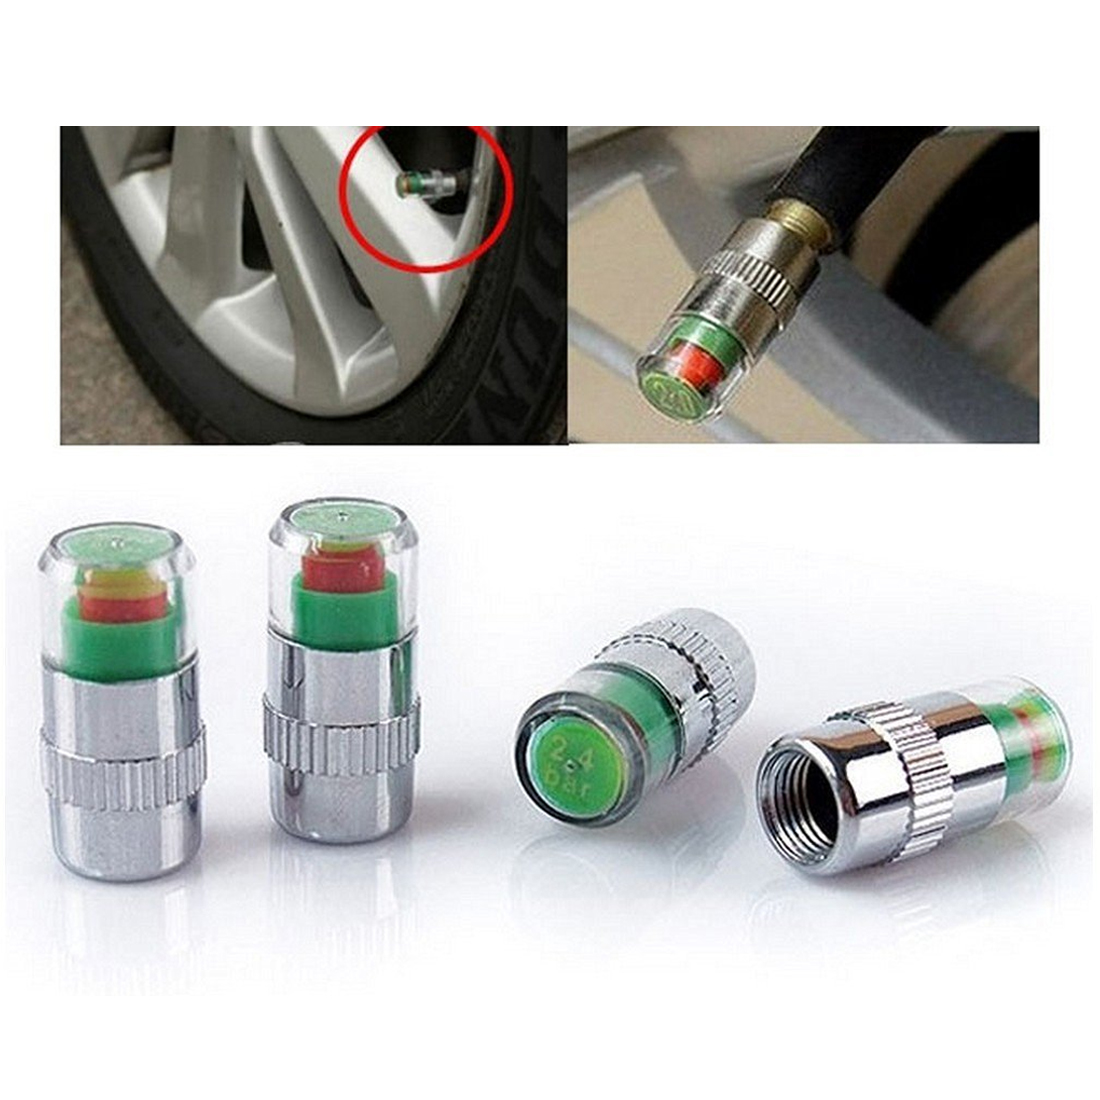 Hot! 4Pcs/Lot  Tire Pressure Tire Monitor Pressure Gauge, Tire Gage Alert Sensor Indicator Valve Caps